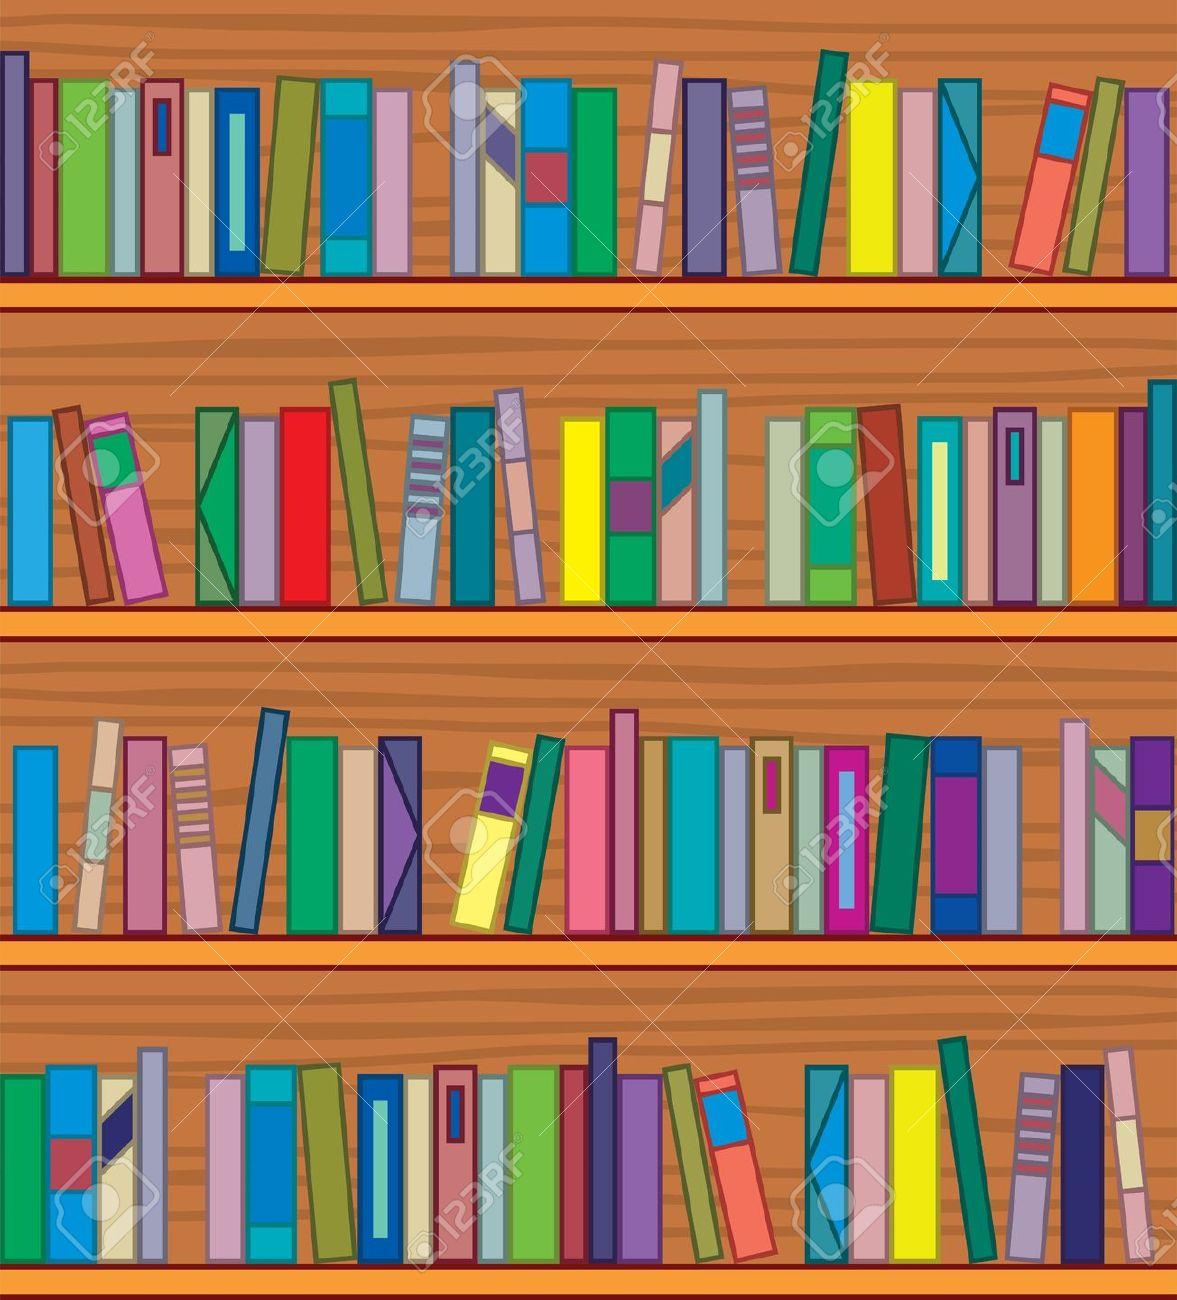 Bookshelf Clipart Clipground